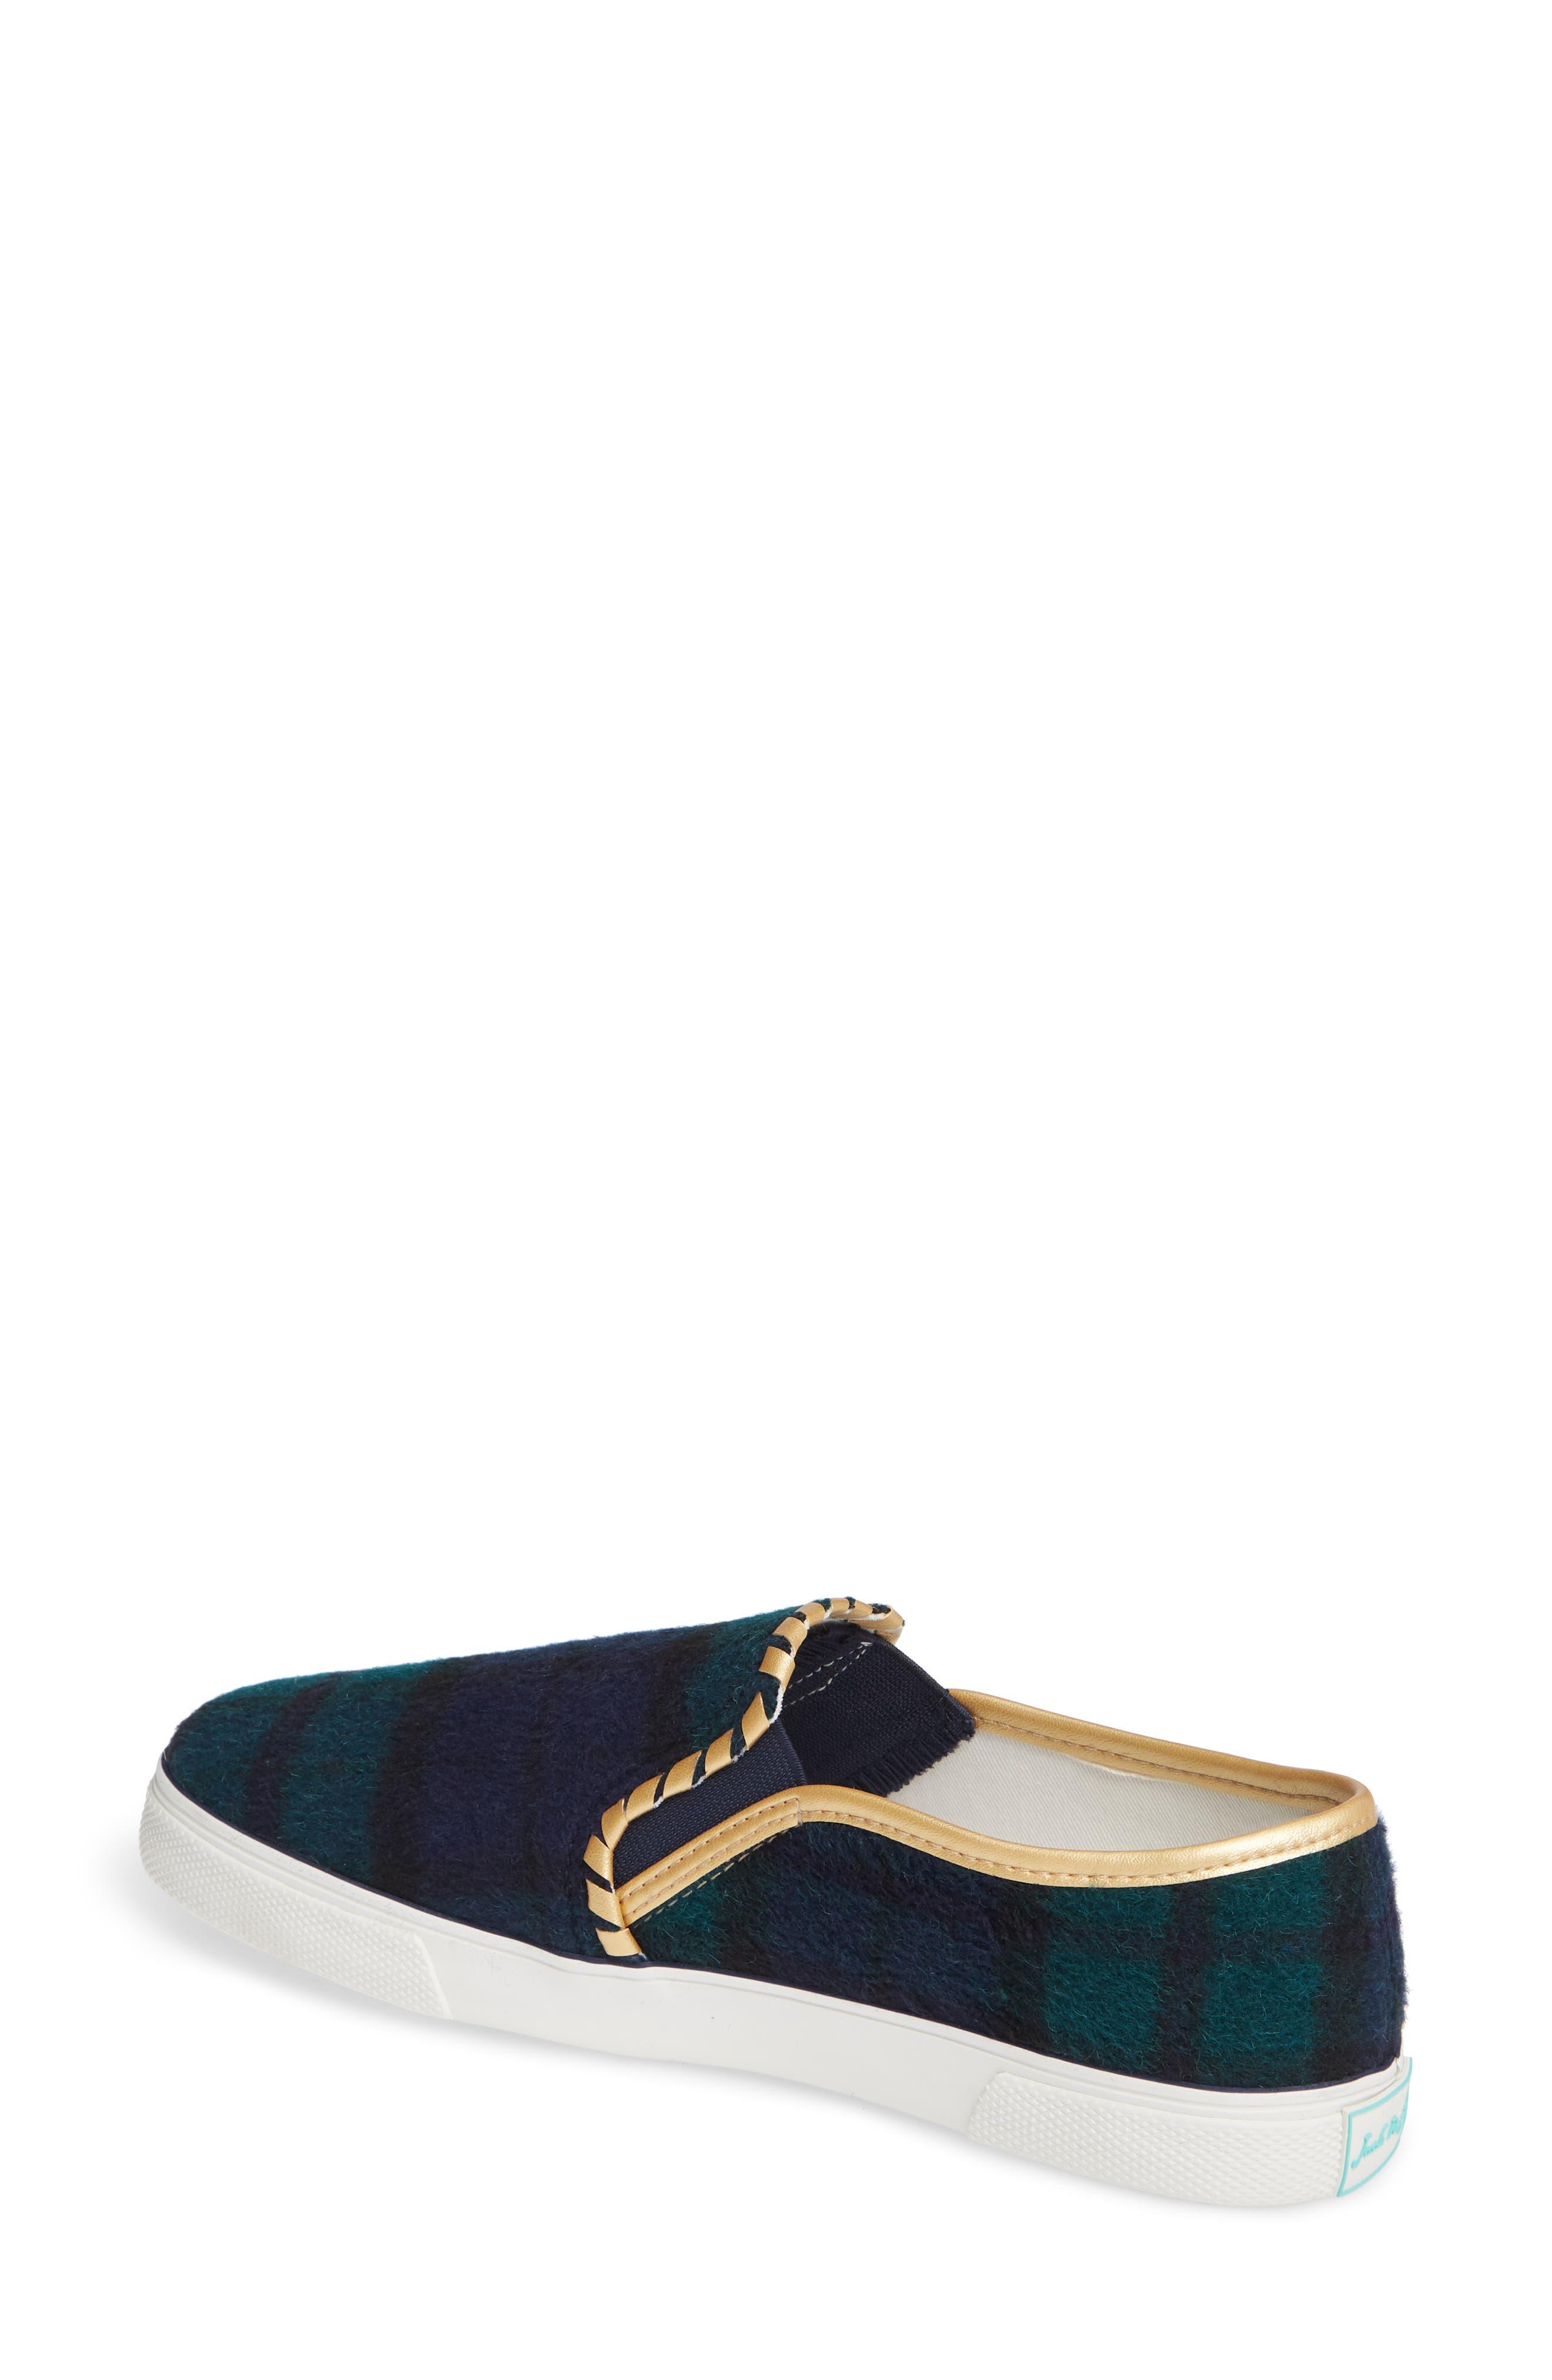 Brynne Slip-On Sneaker,                             Alternate thumbnail 2, color,                             MIDNIGHT/ GREEN FABRIC